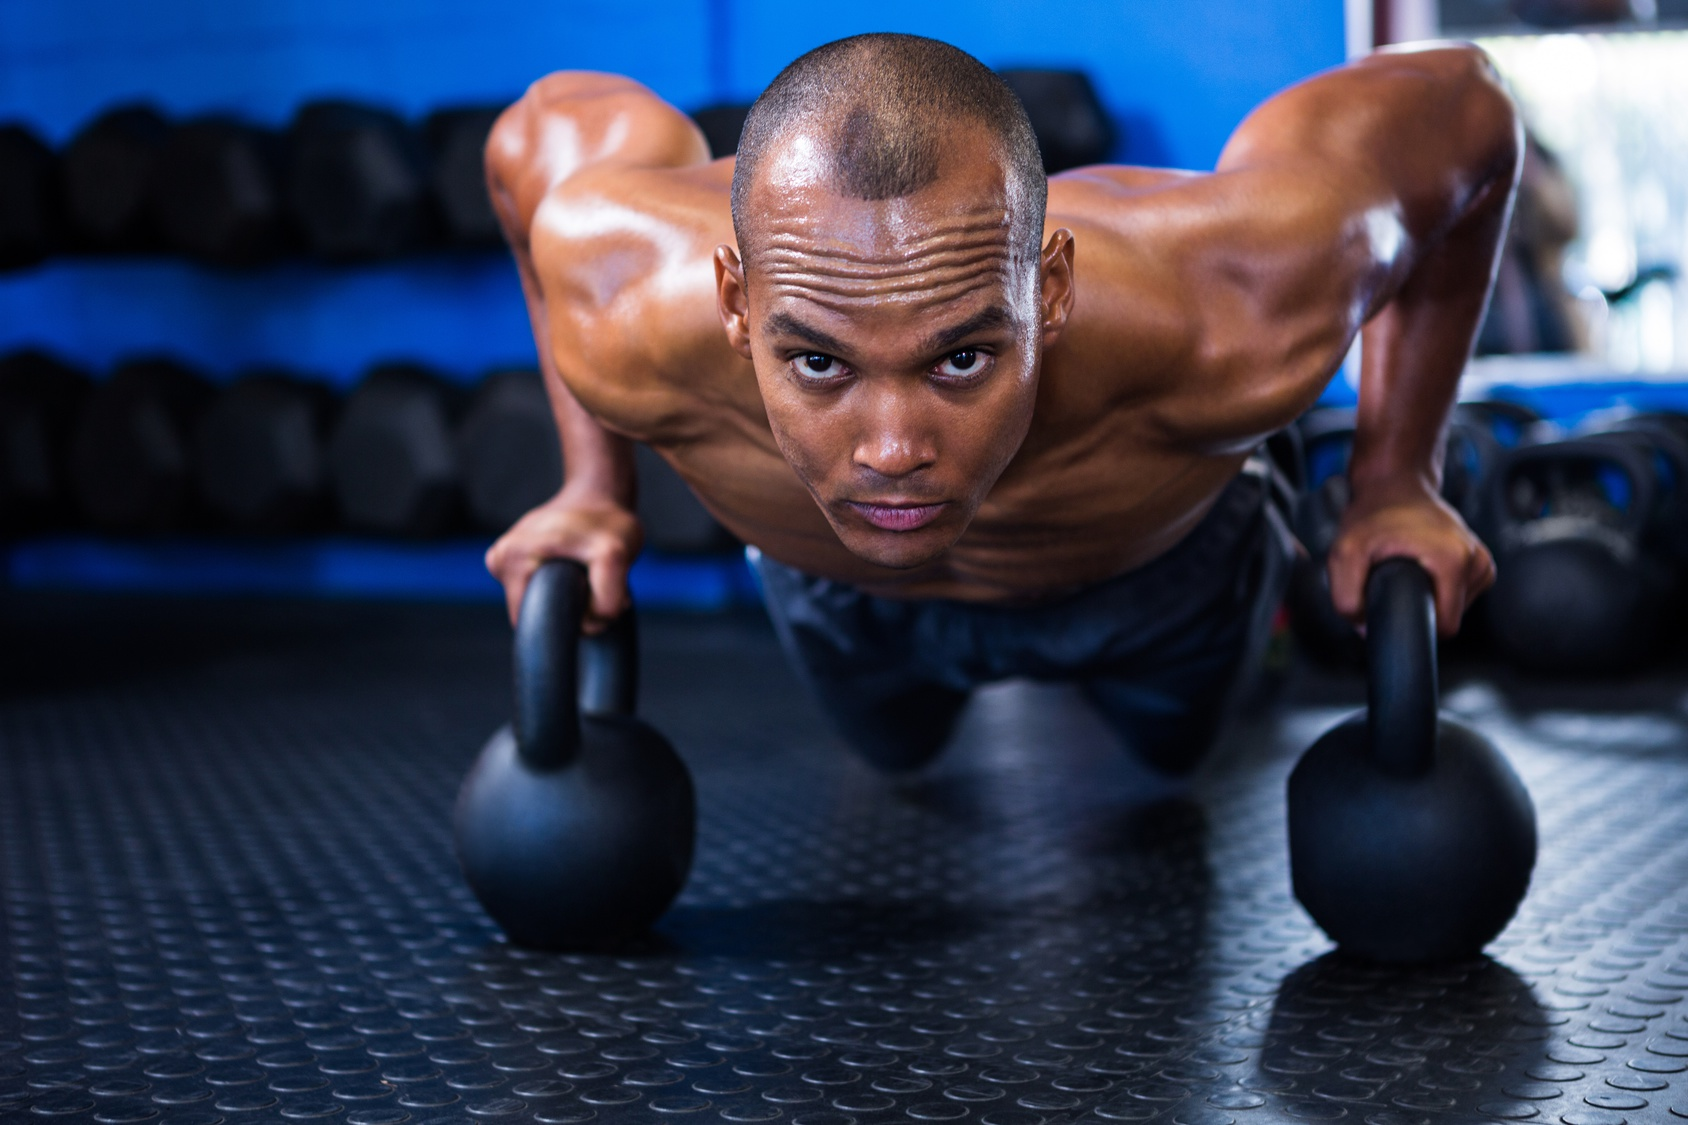 Man doing push-ups with kettlebells